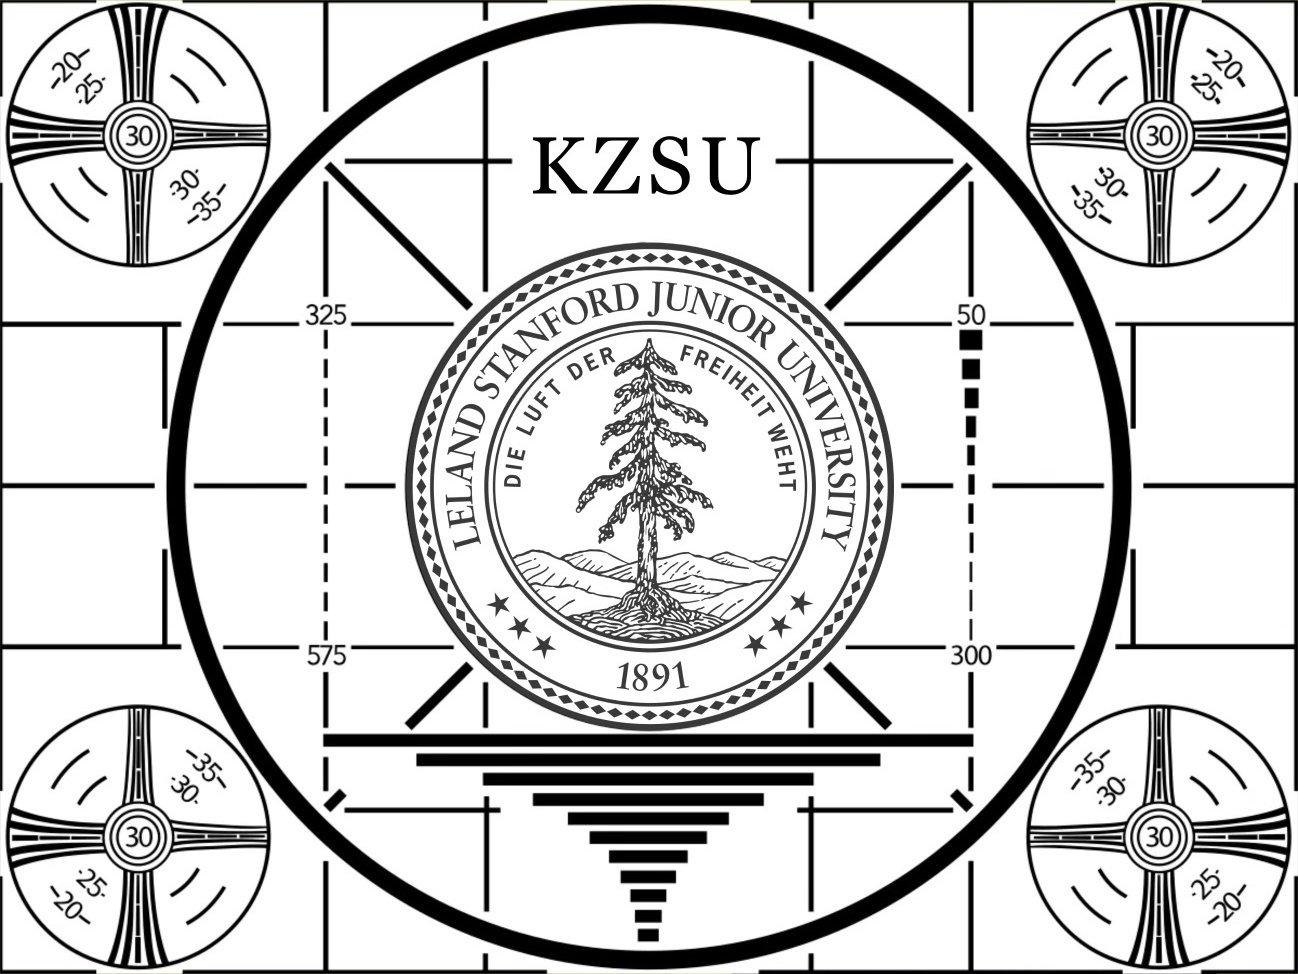 Black and white image of Stanford KZSU logo